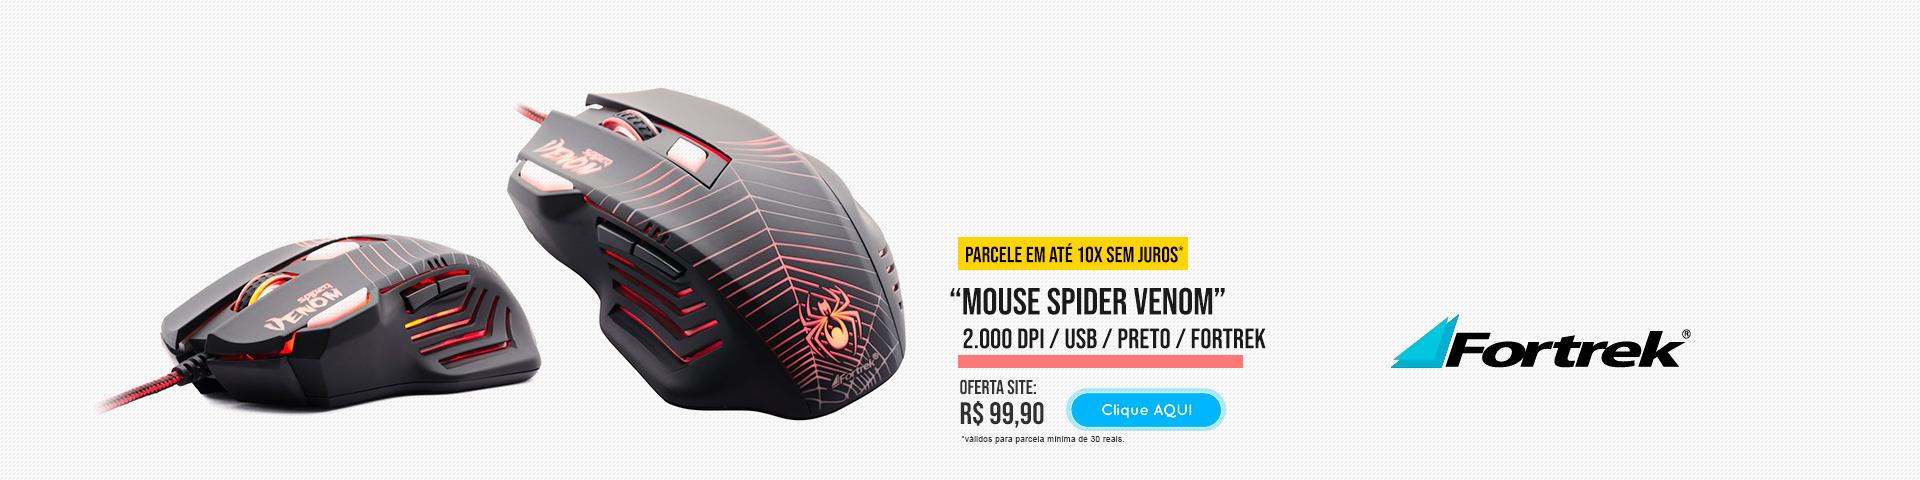 Mouse Fortrek Spider Venom